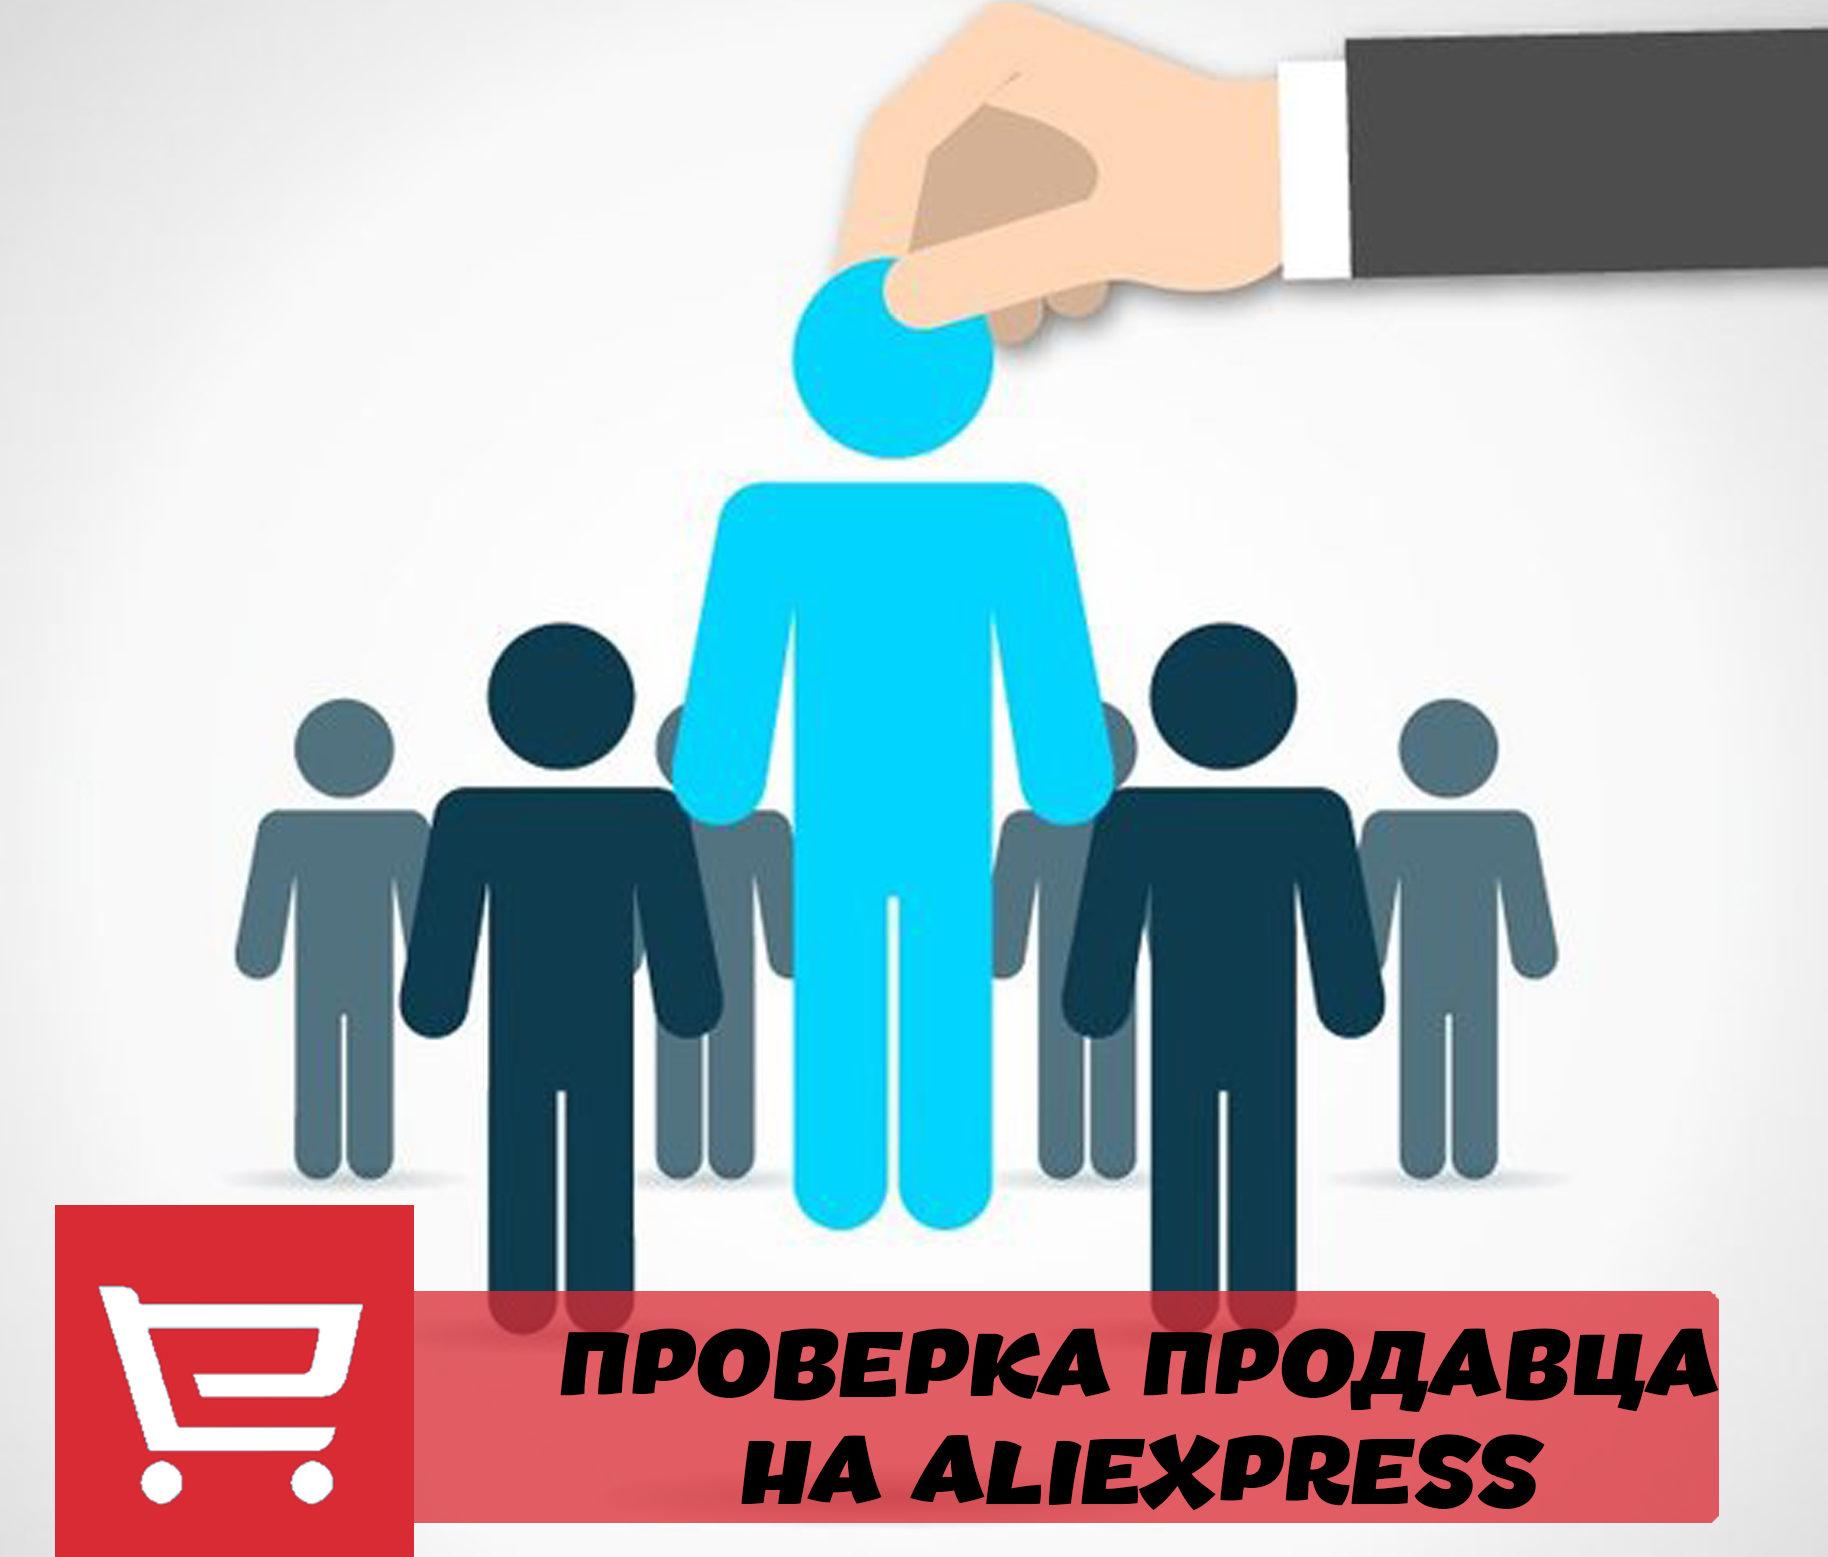 Проверка продавца на Алиэкспресс